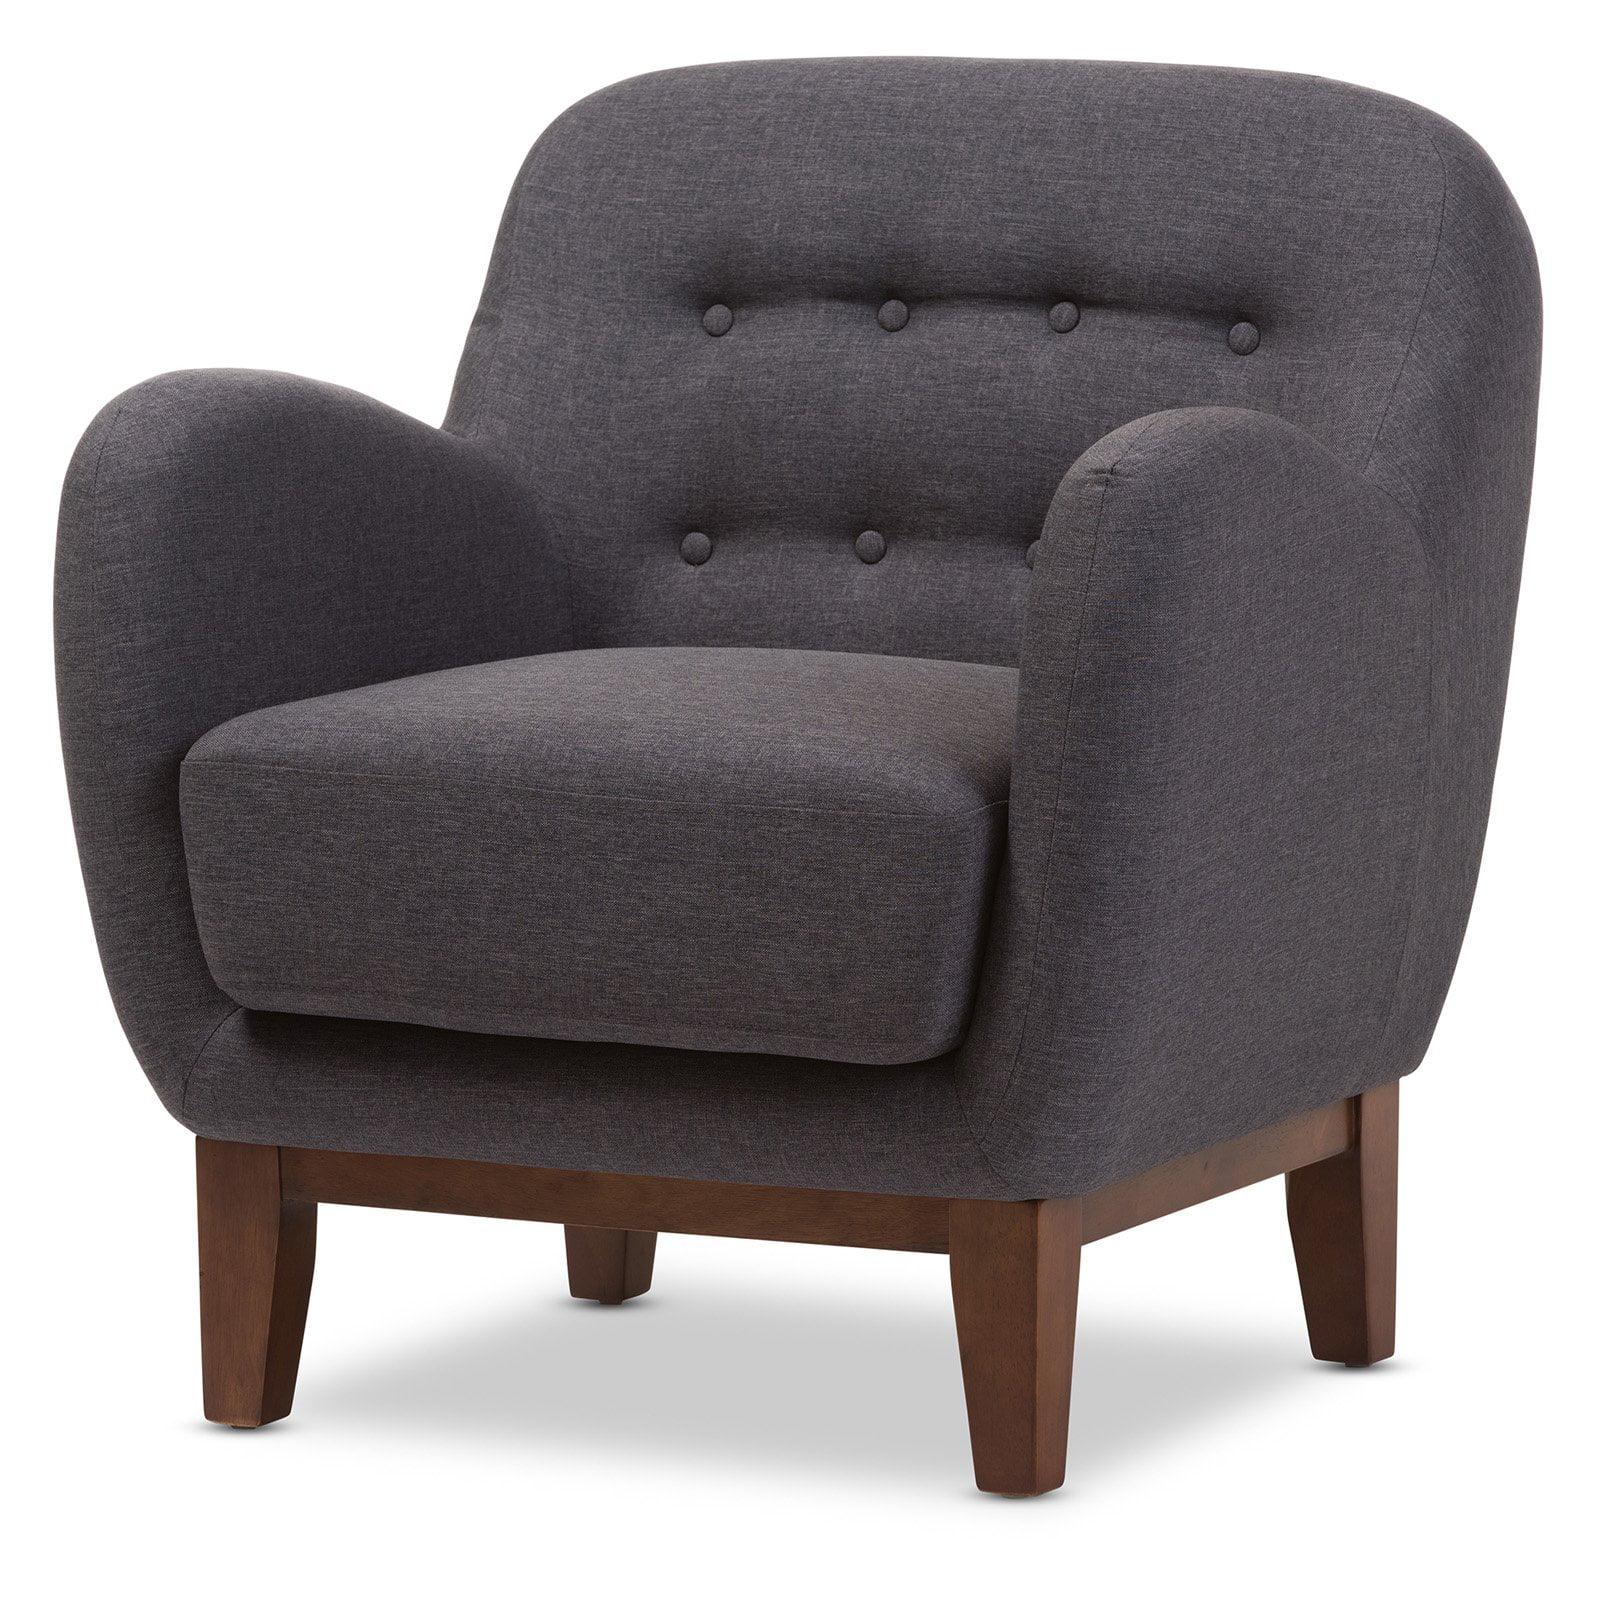 Baxton Studio Sophia Mid-Century Dark Gray Fabric Upholstered Button-Tufted Armchair by Baxton Studio